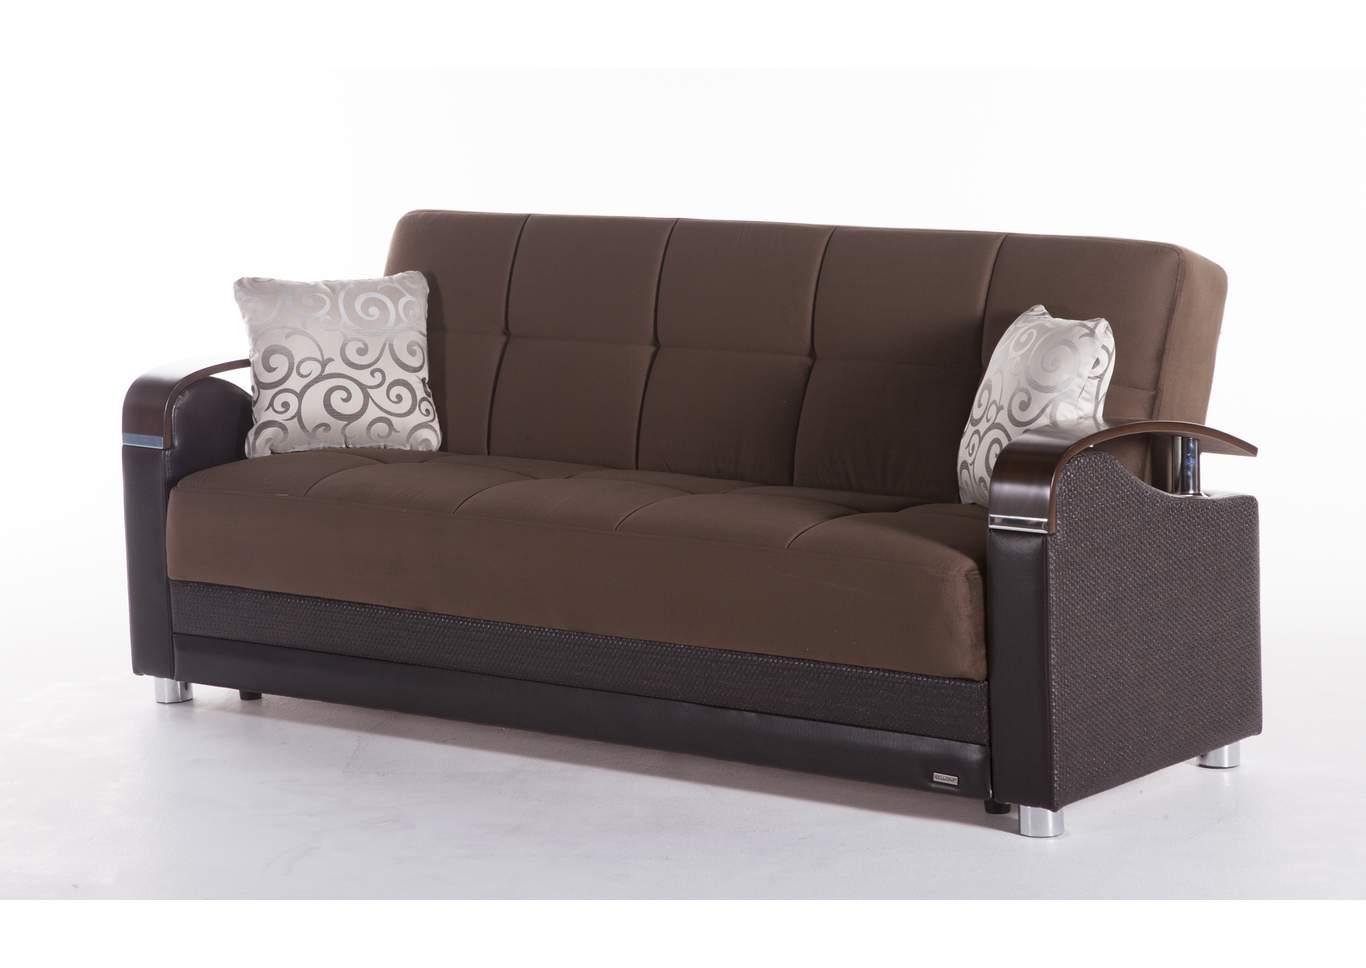 Awe Inspiring Charisma Furniture Luna Naomi Brown 3 Piece Sofa Set Unemploymentrelief Wooden Chair Designs For Living Room Unemploymentrelieforg